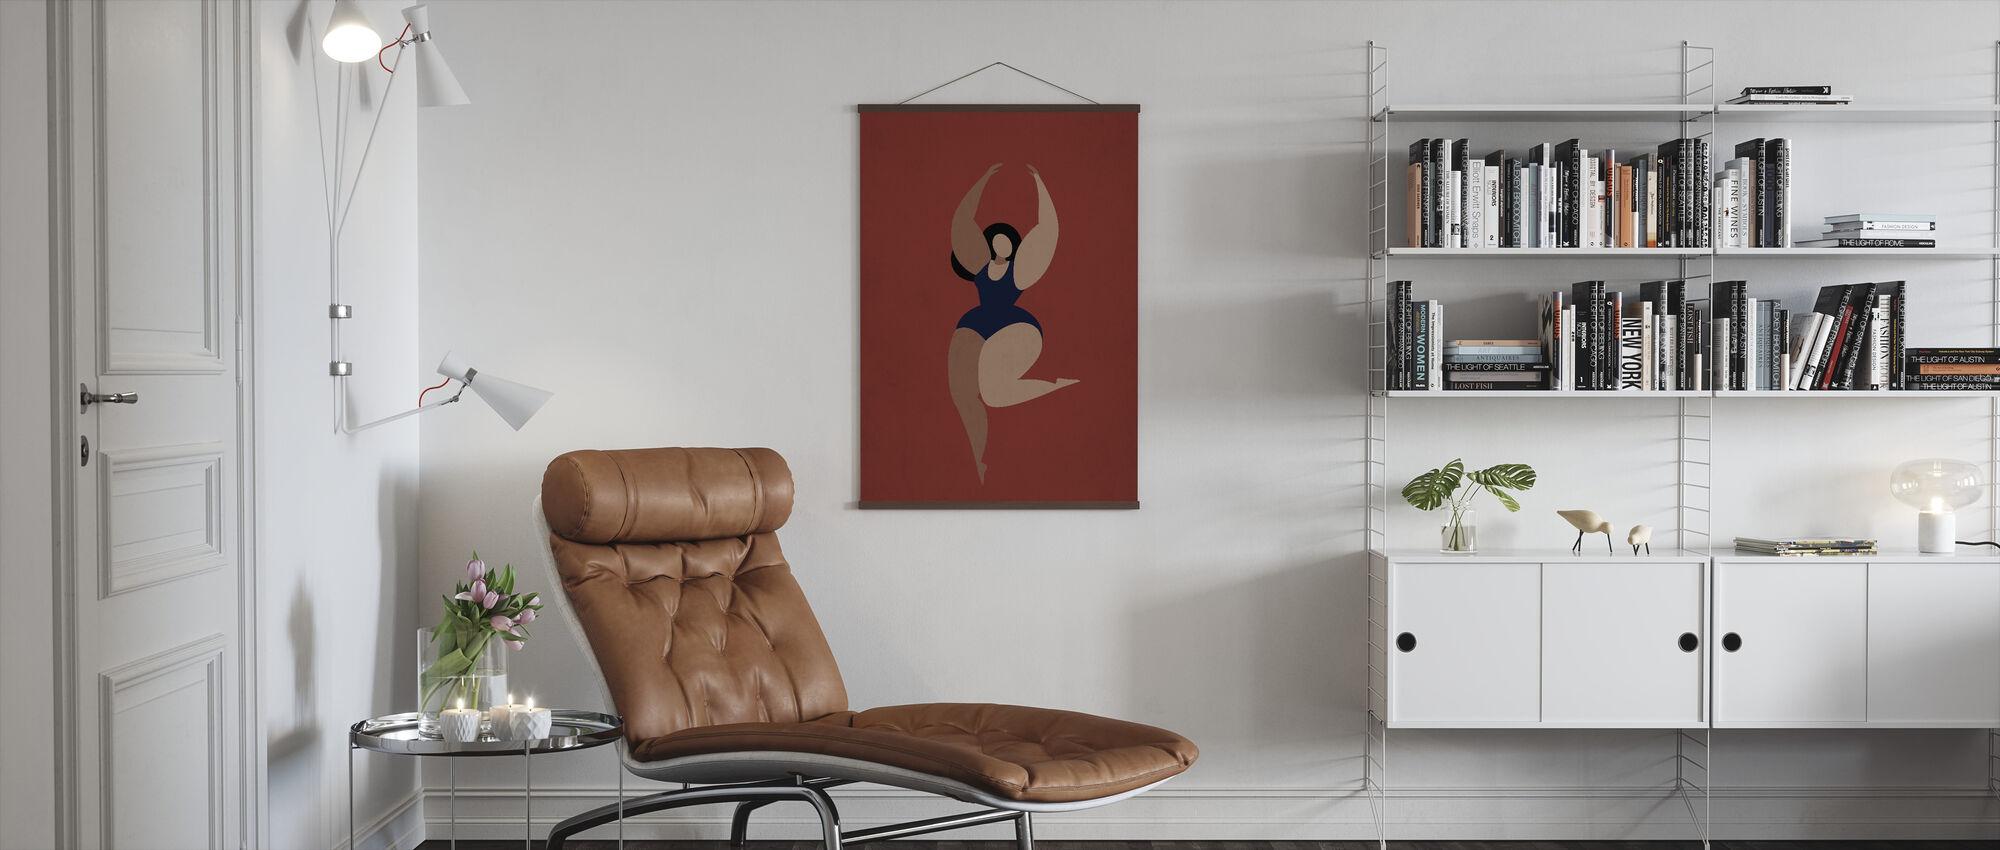 Prima Ballerina - Poster - Living Room